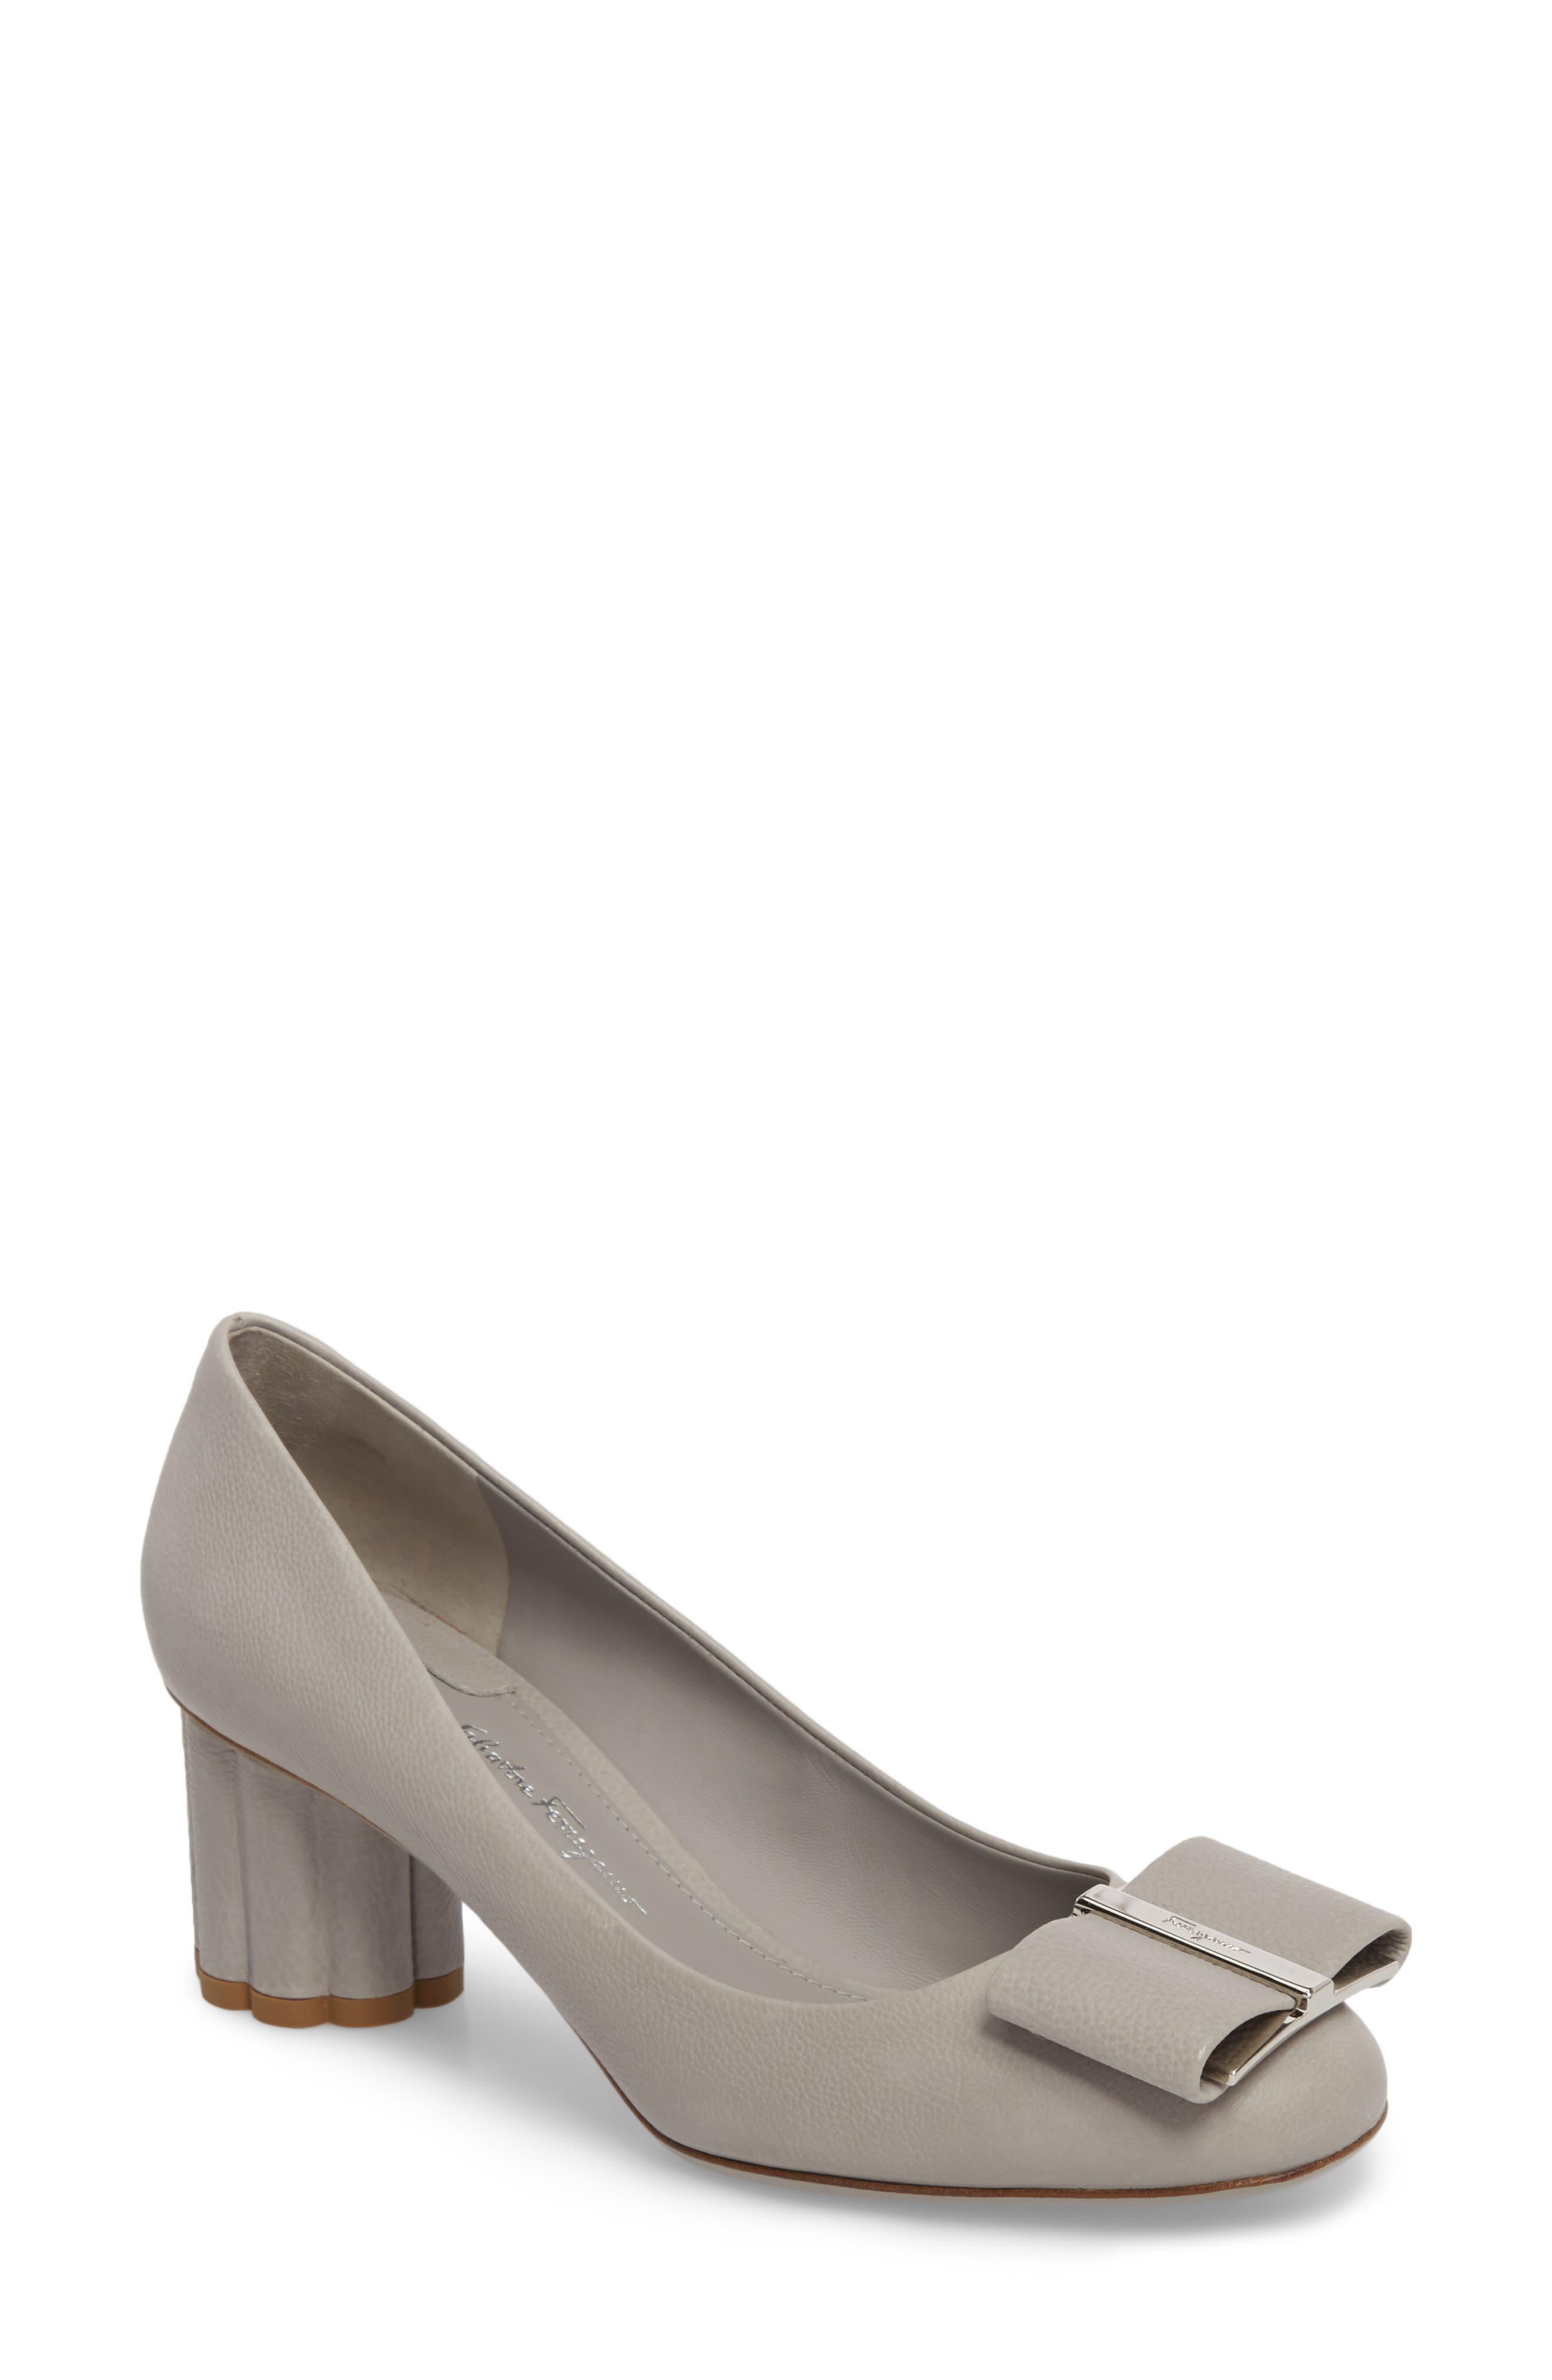 Salvatore Ferragamo Bow Flower Heel Pump (Women)